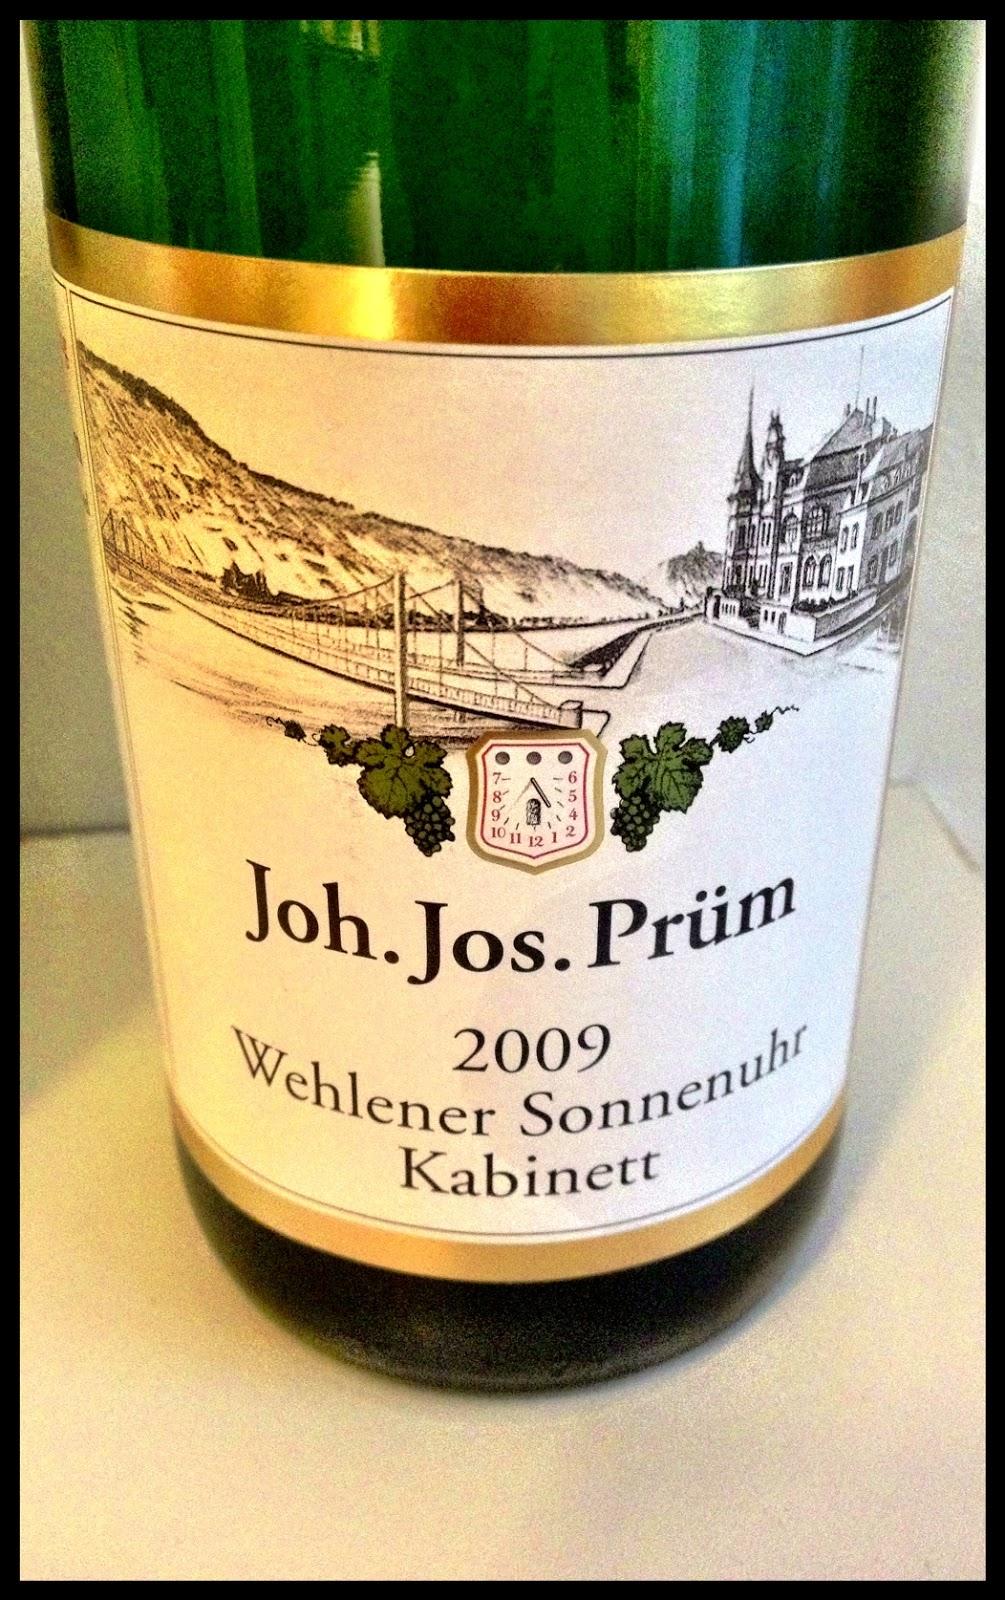 Tasting note on the 2009 Joh. Jos. Prüm Wehlener Sonnenuhr Riesling Kabinett